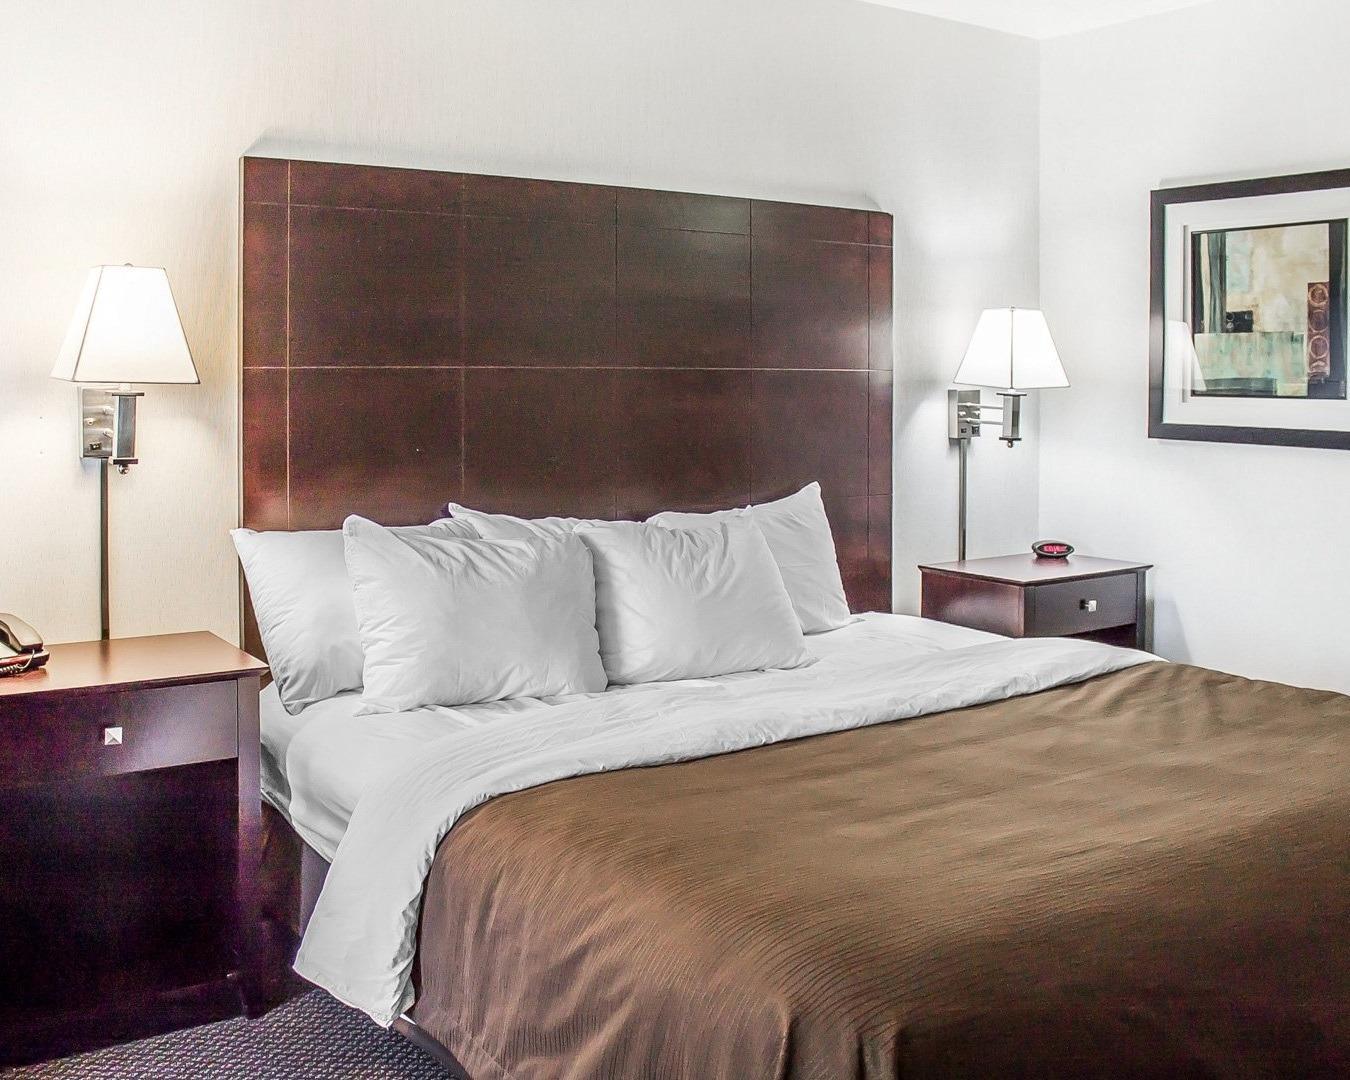 Quality Inn & Suites, Sturgeon Bay WI